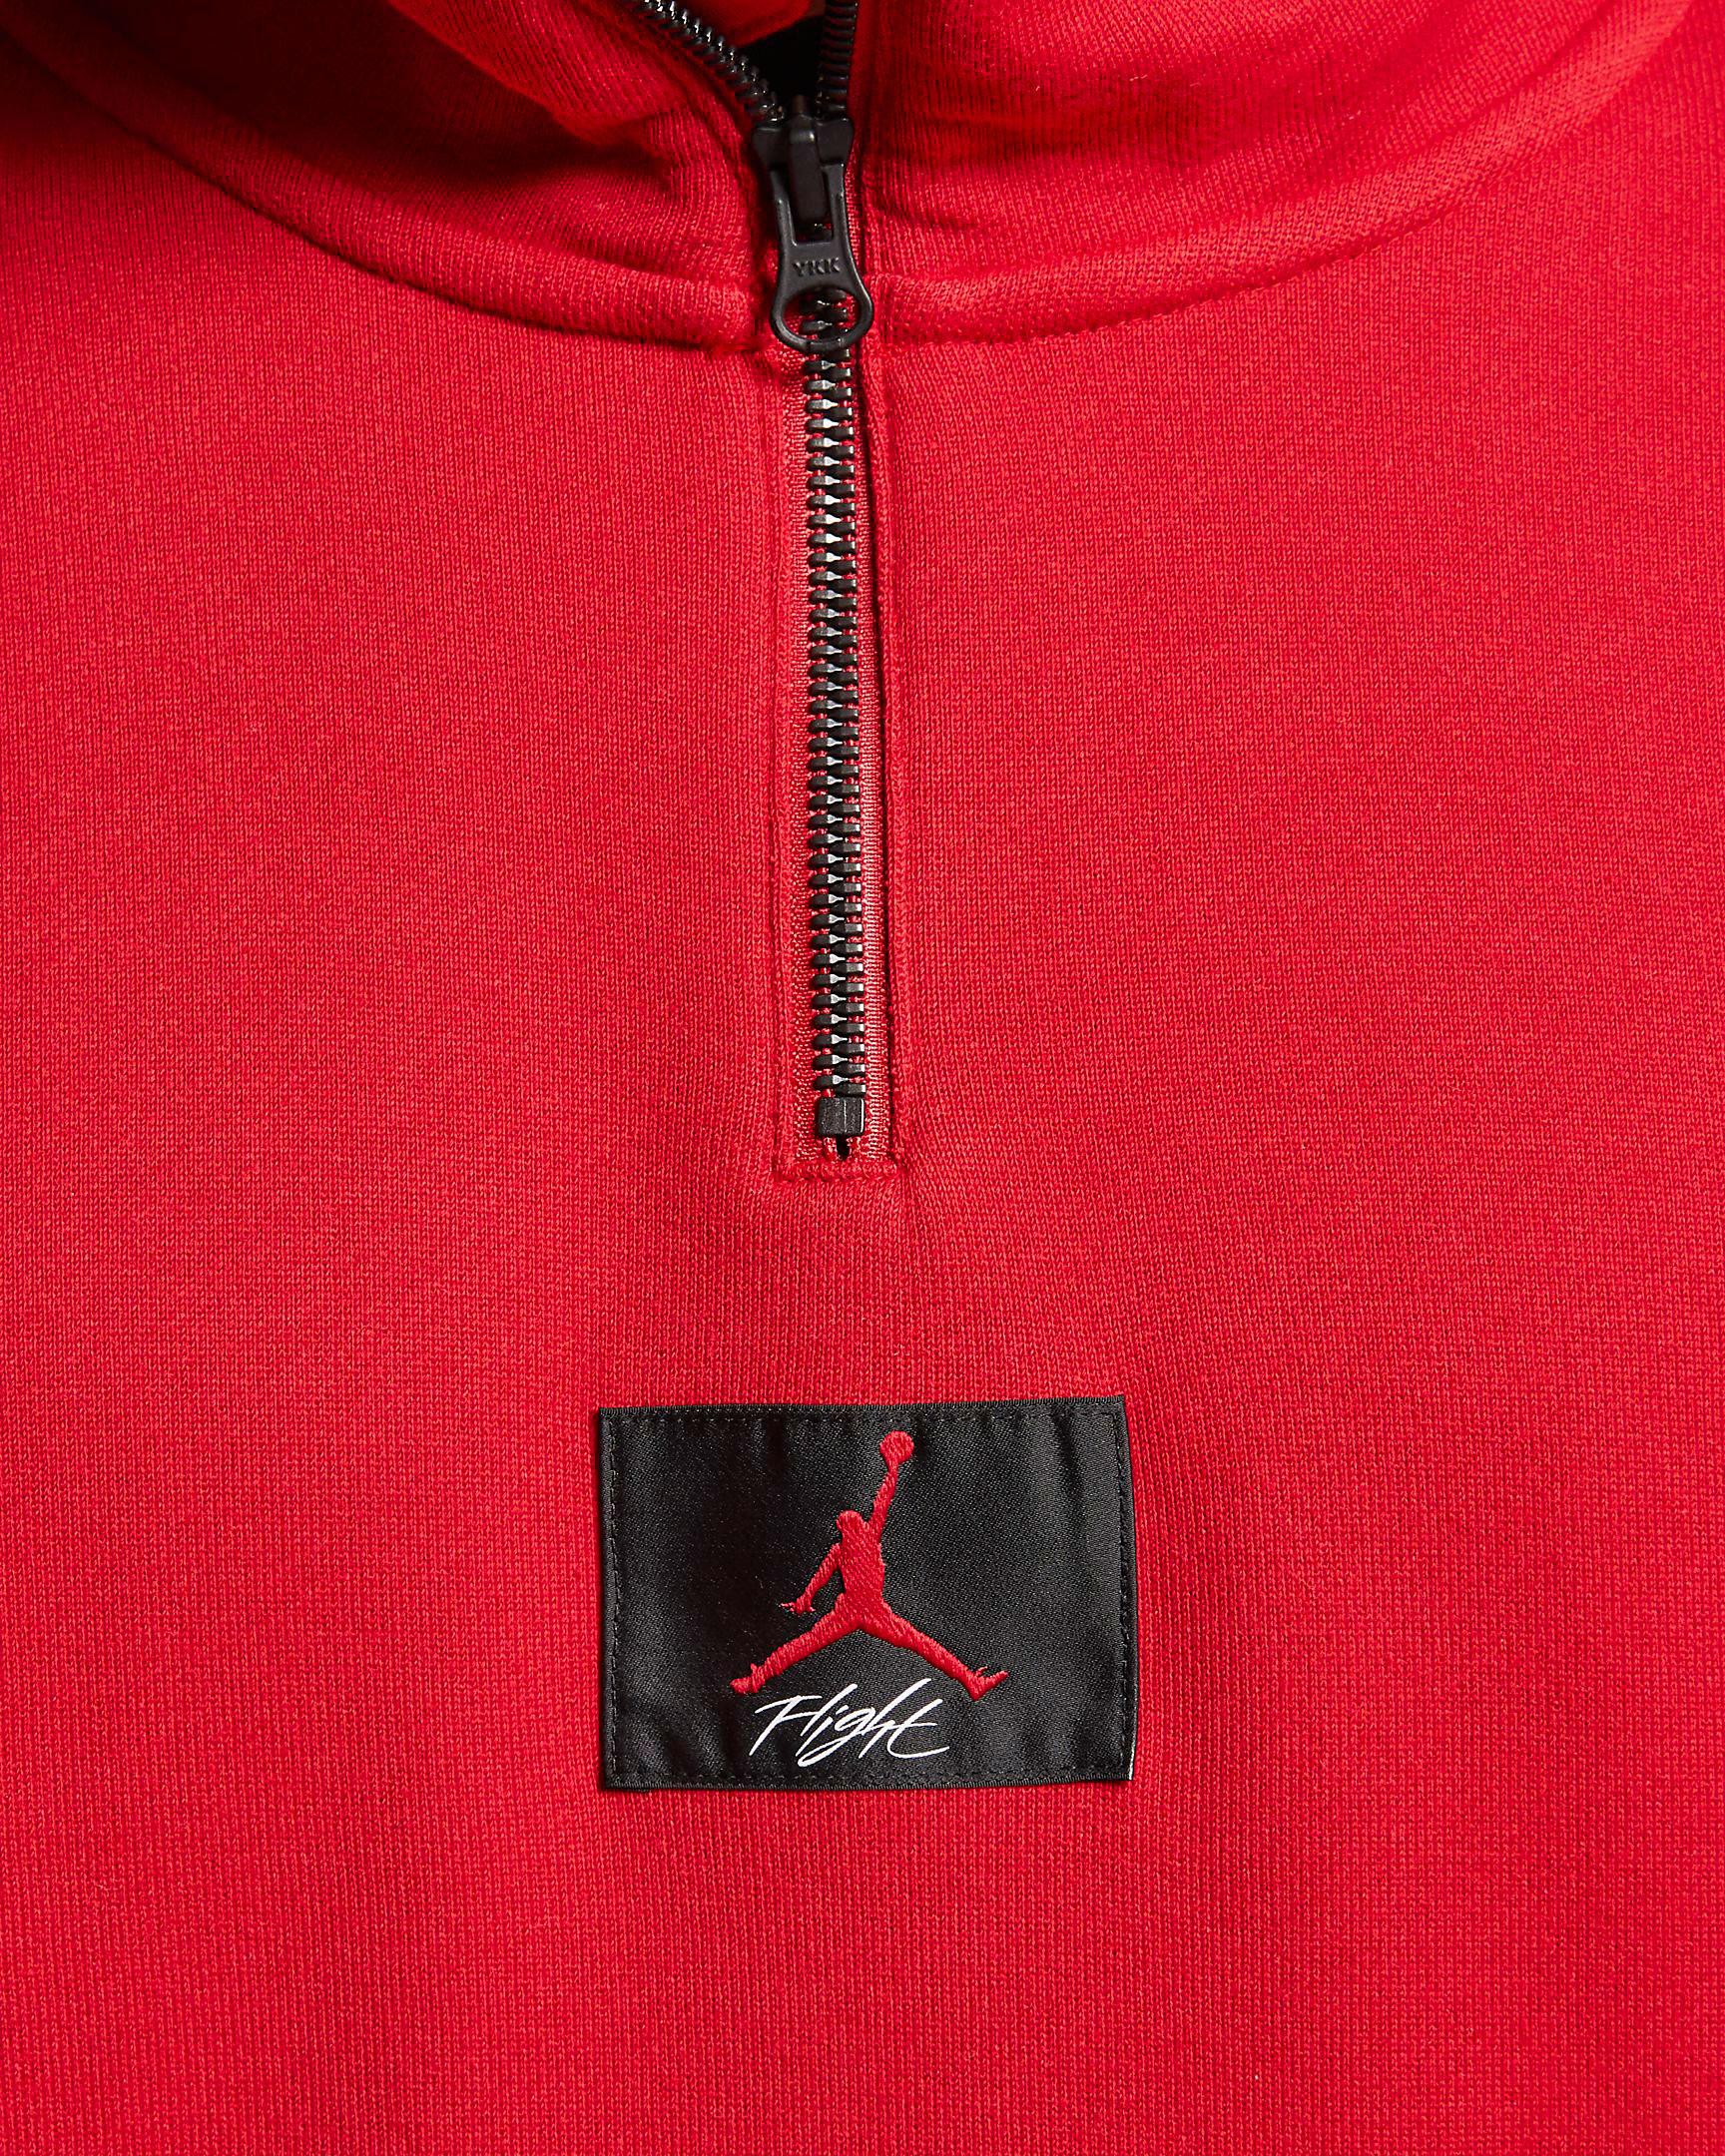 air-jordan-4-bred-sweatshirt-match-4